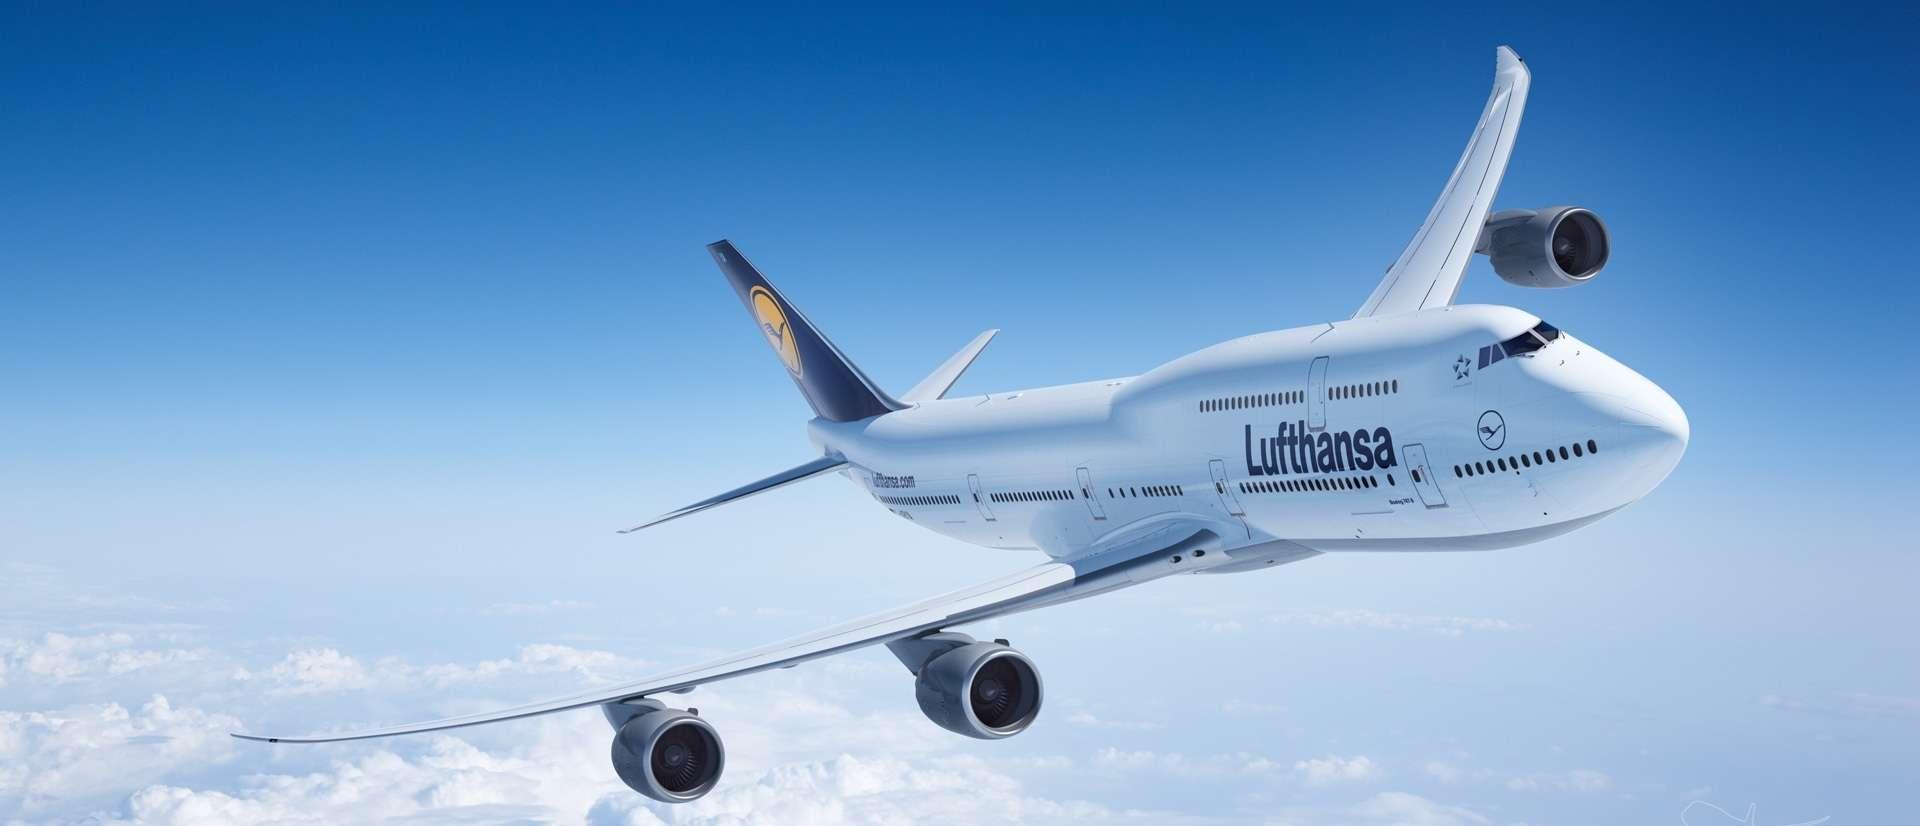 Lufthansa reveals new ad